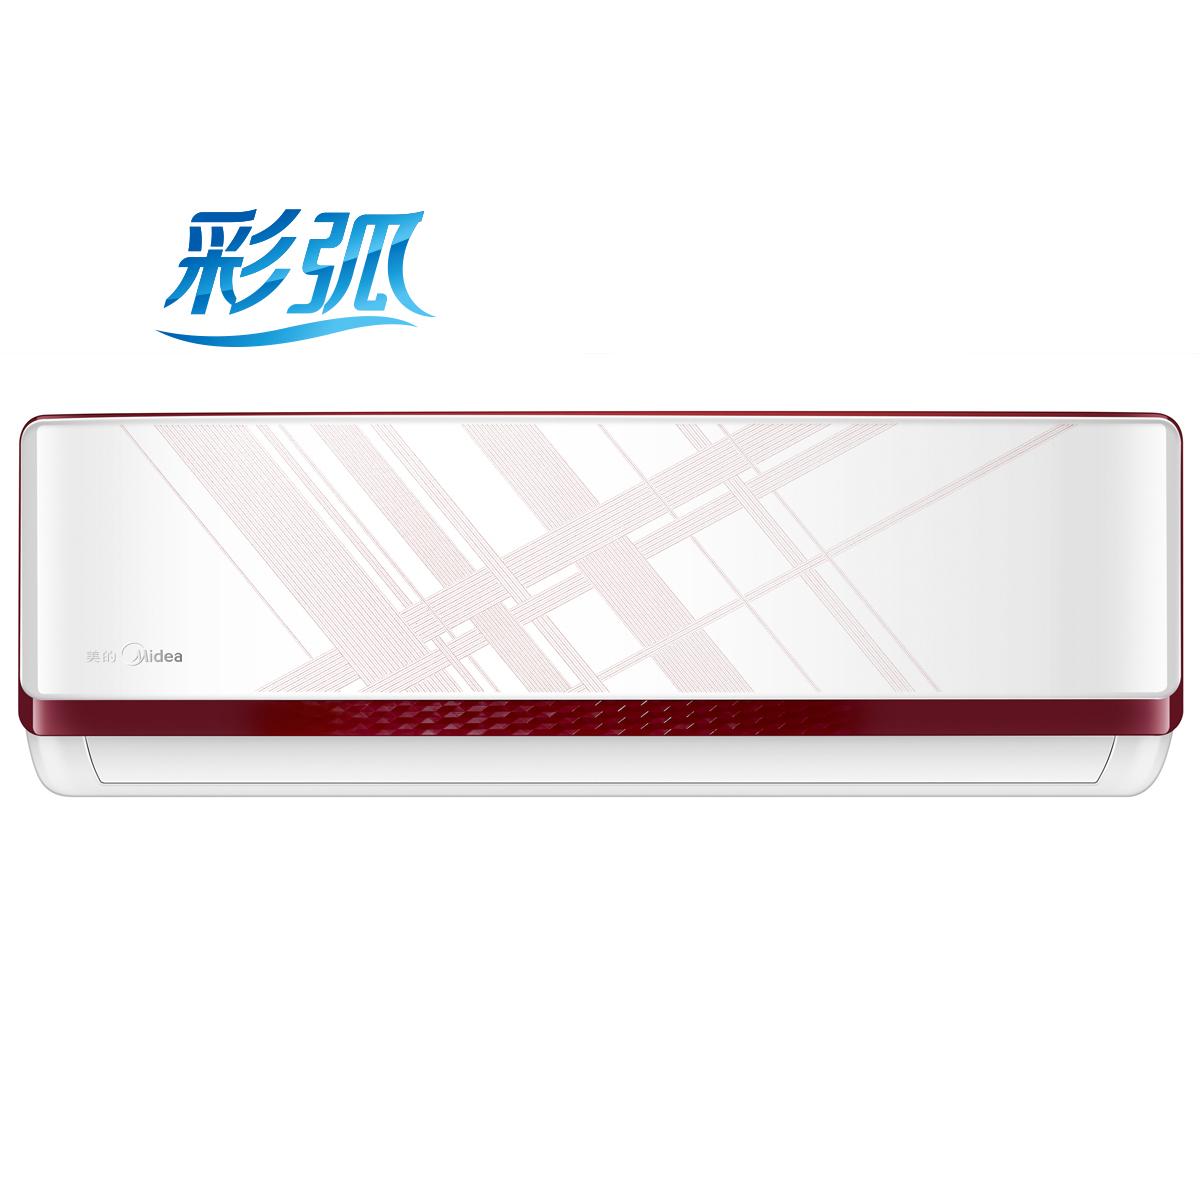 Midea/美的 KFR-32GW/BP2DN1Y-LE(B3) 家用空调套机 说明书.pdf